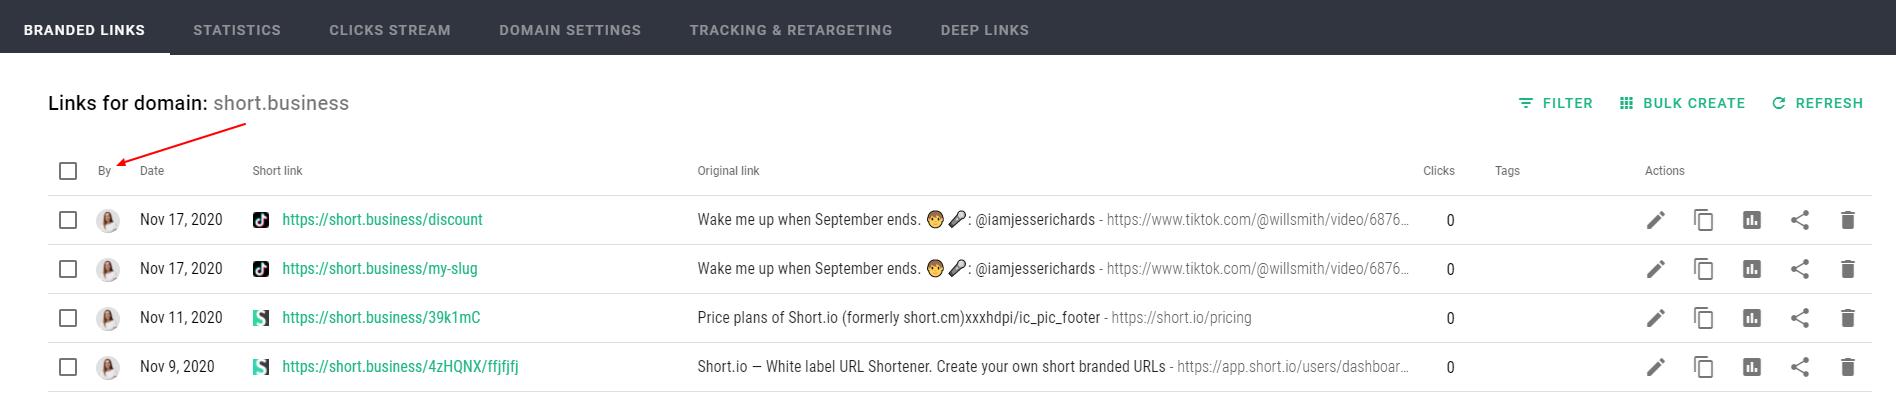 Branded-links-Short-io